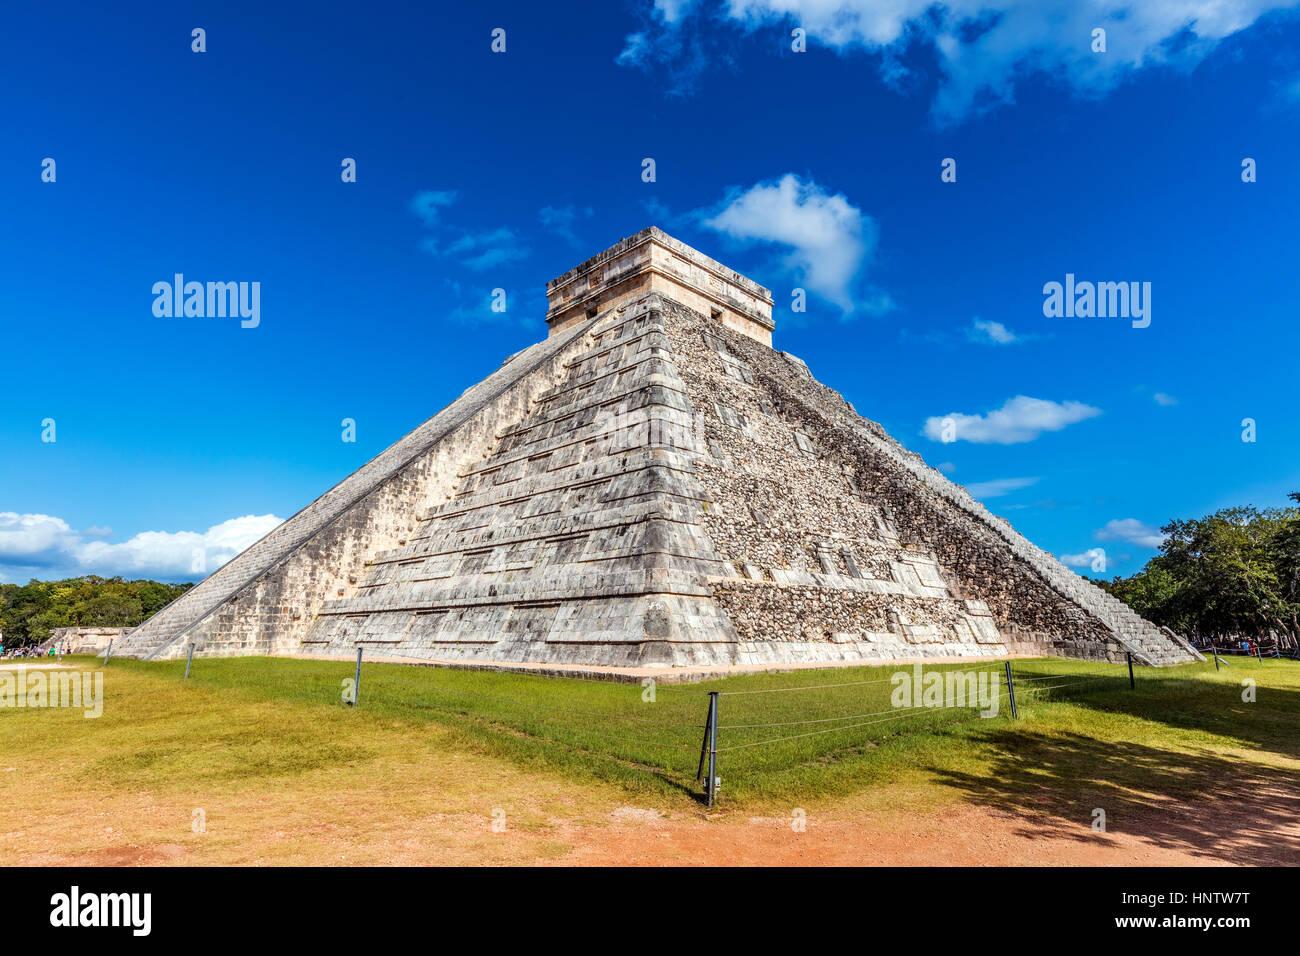 Stock Foto - Tempel von Kukulcán in Chichén Itzá, Mexiko Stockbild